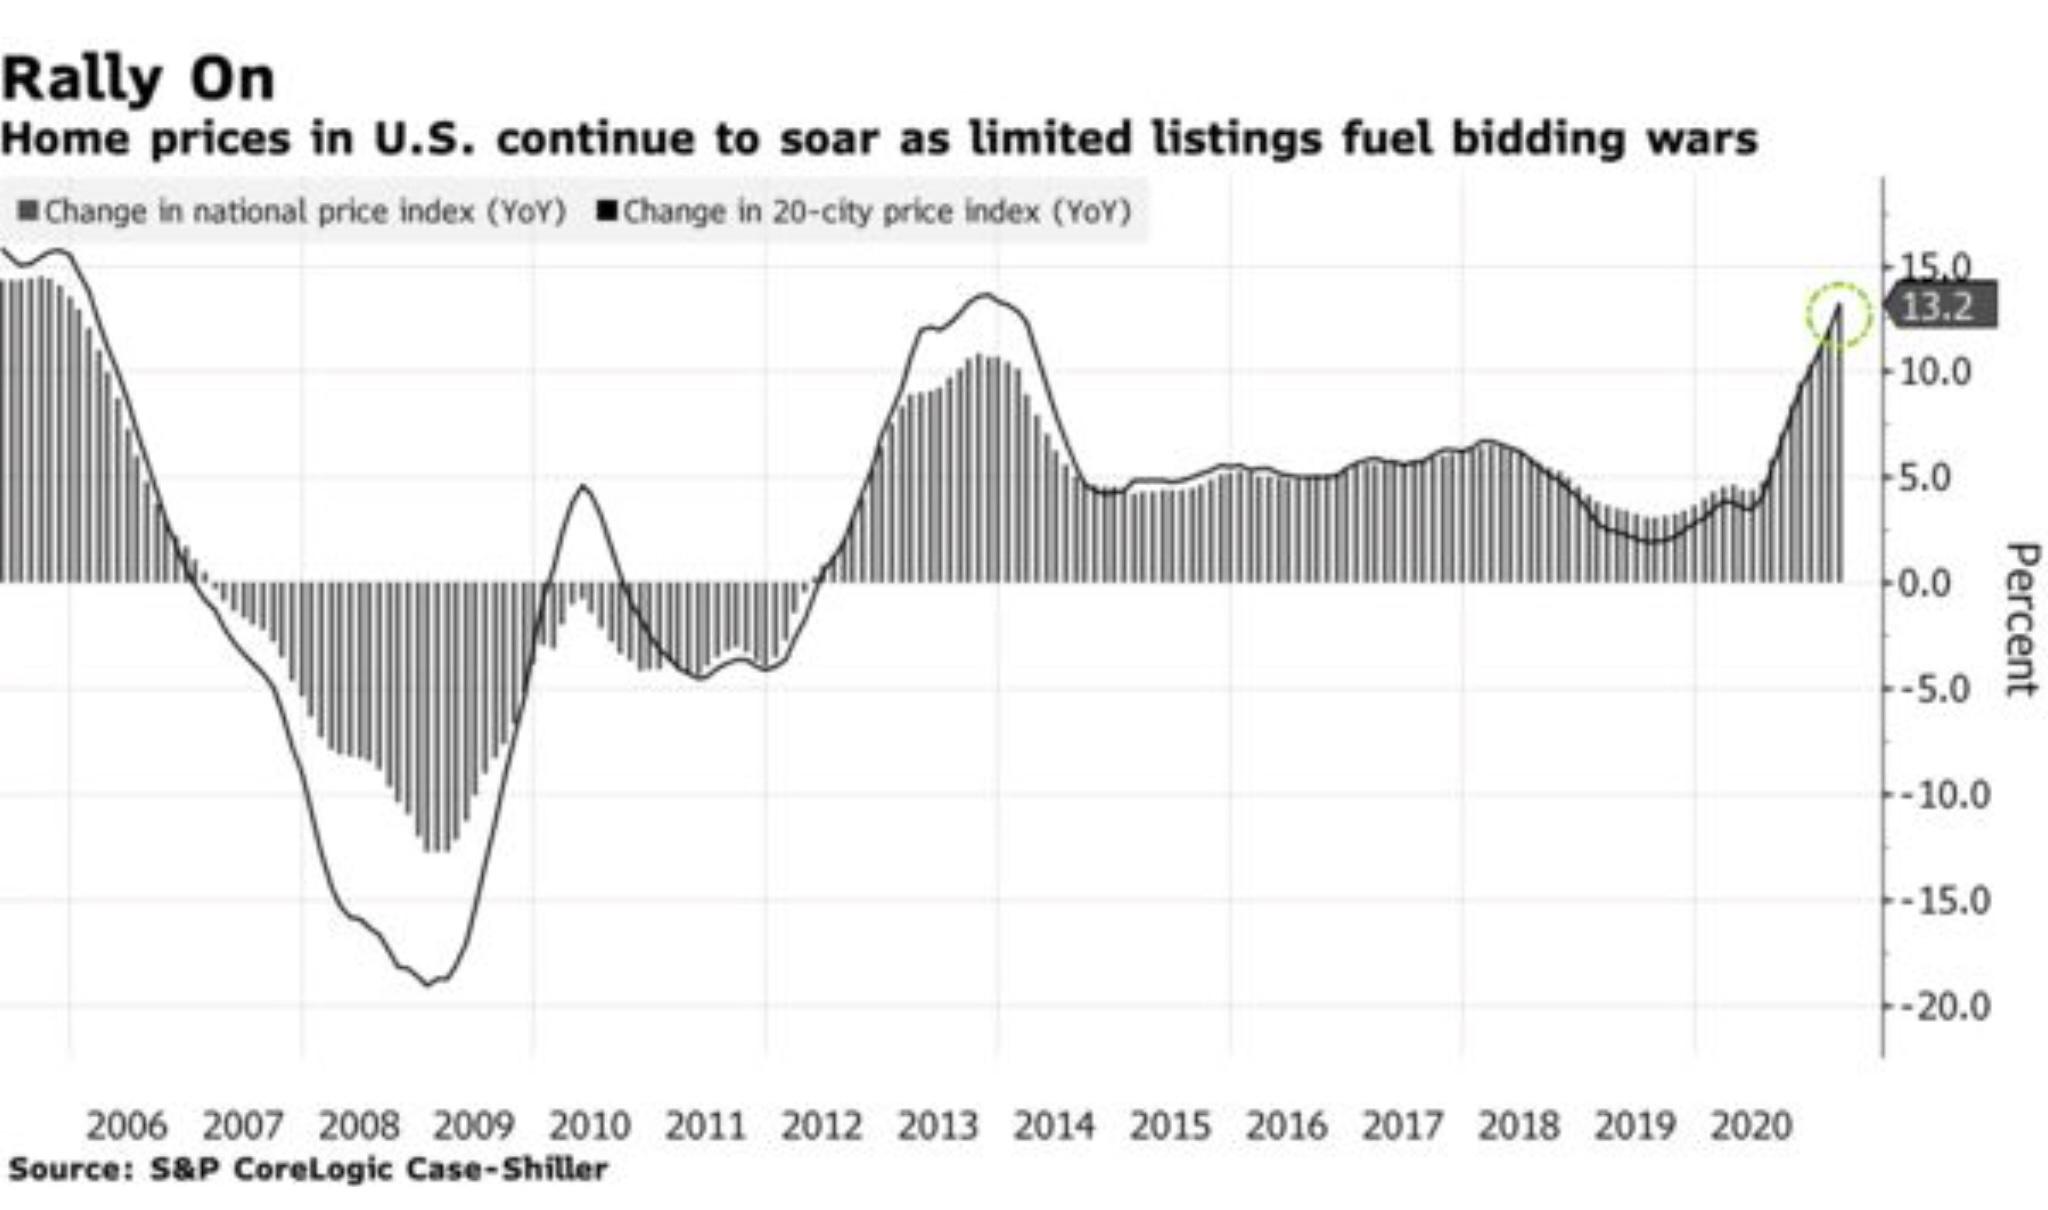 U.S. Home Prices Rally On